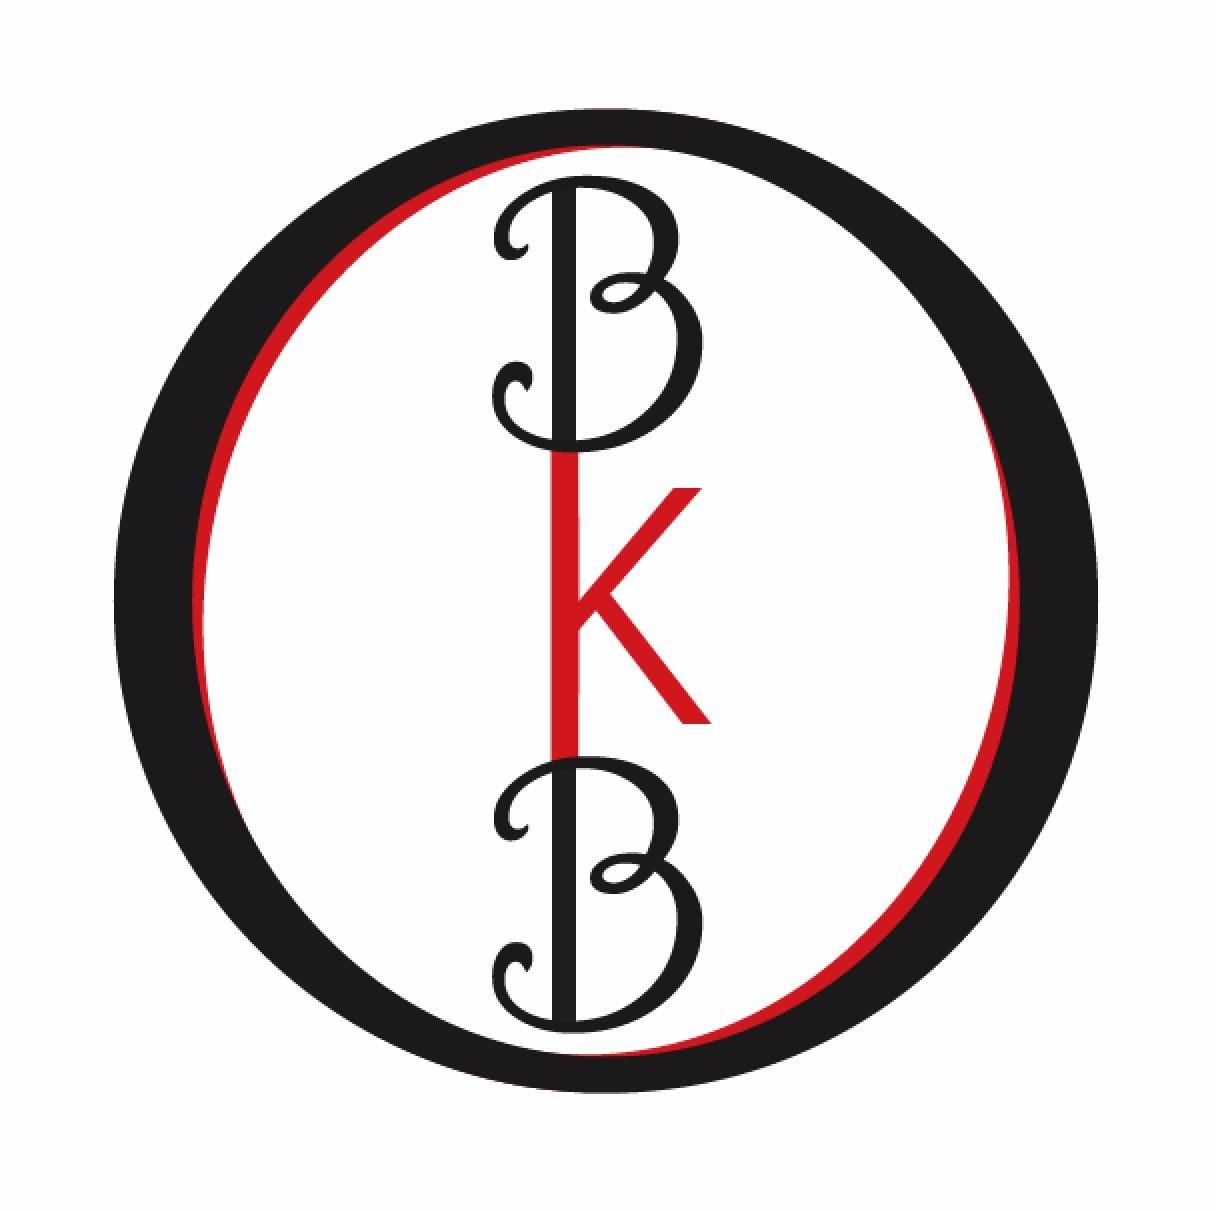 B K Bagpipes